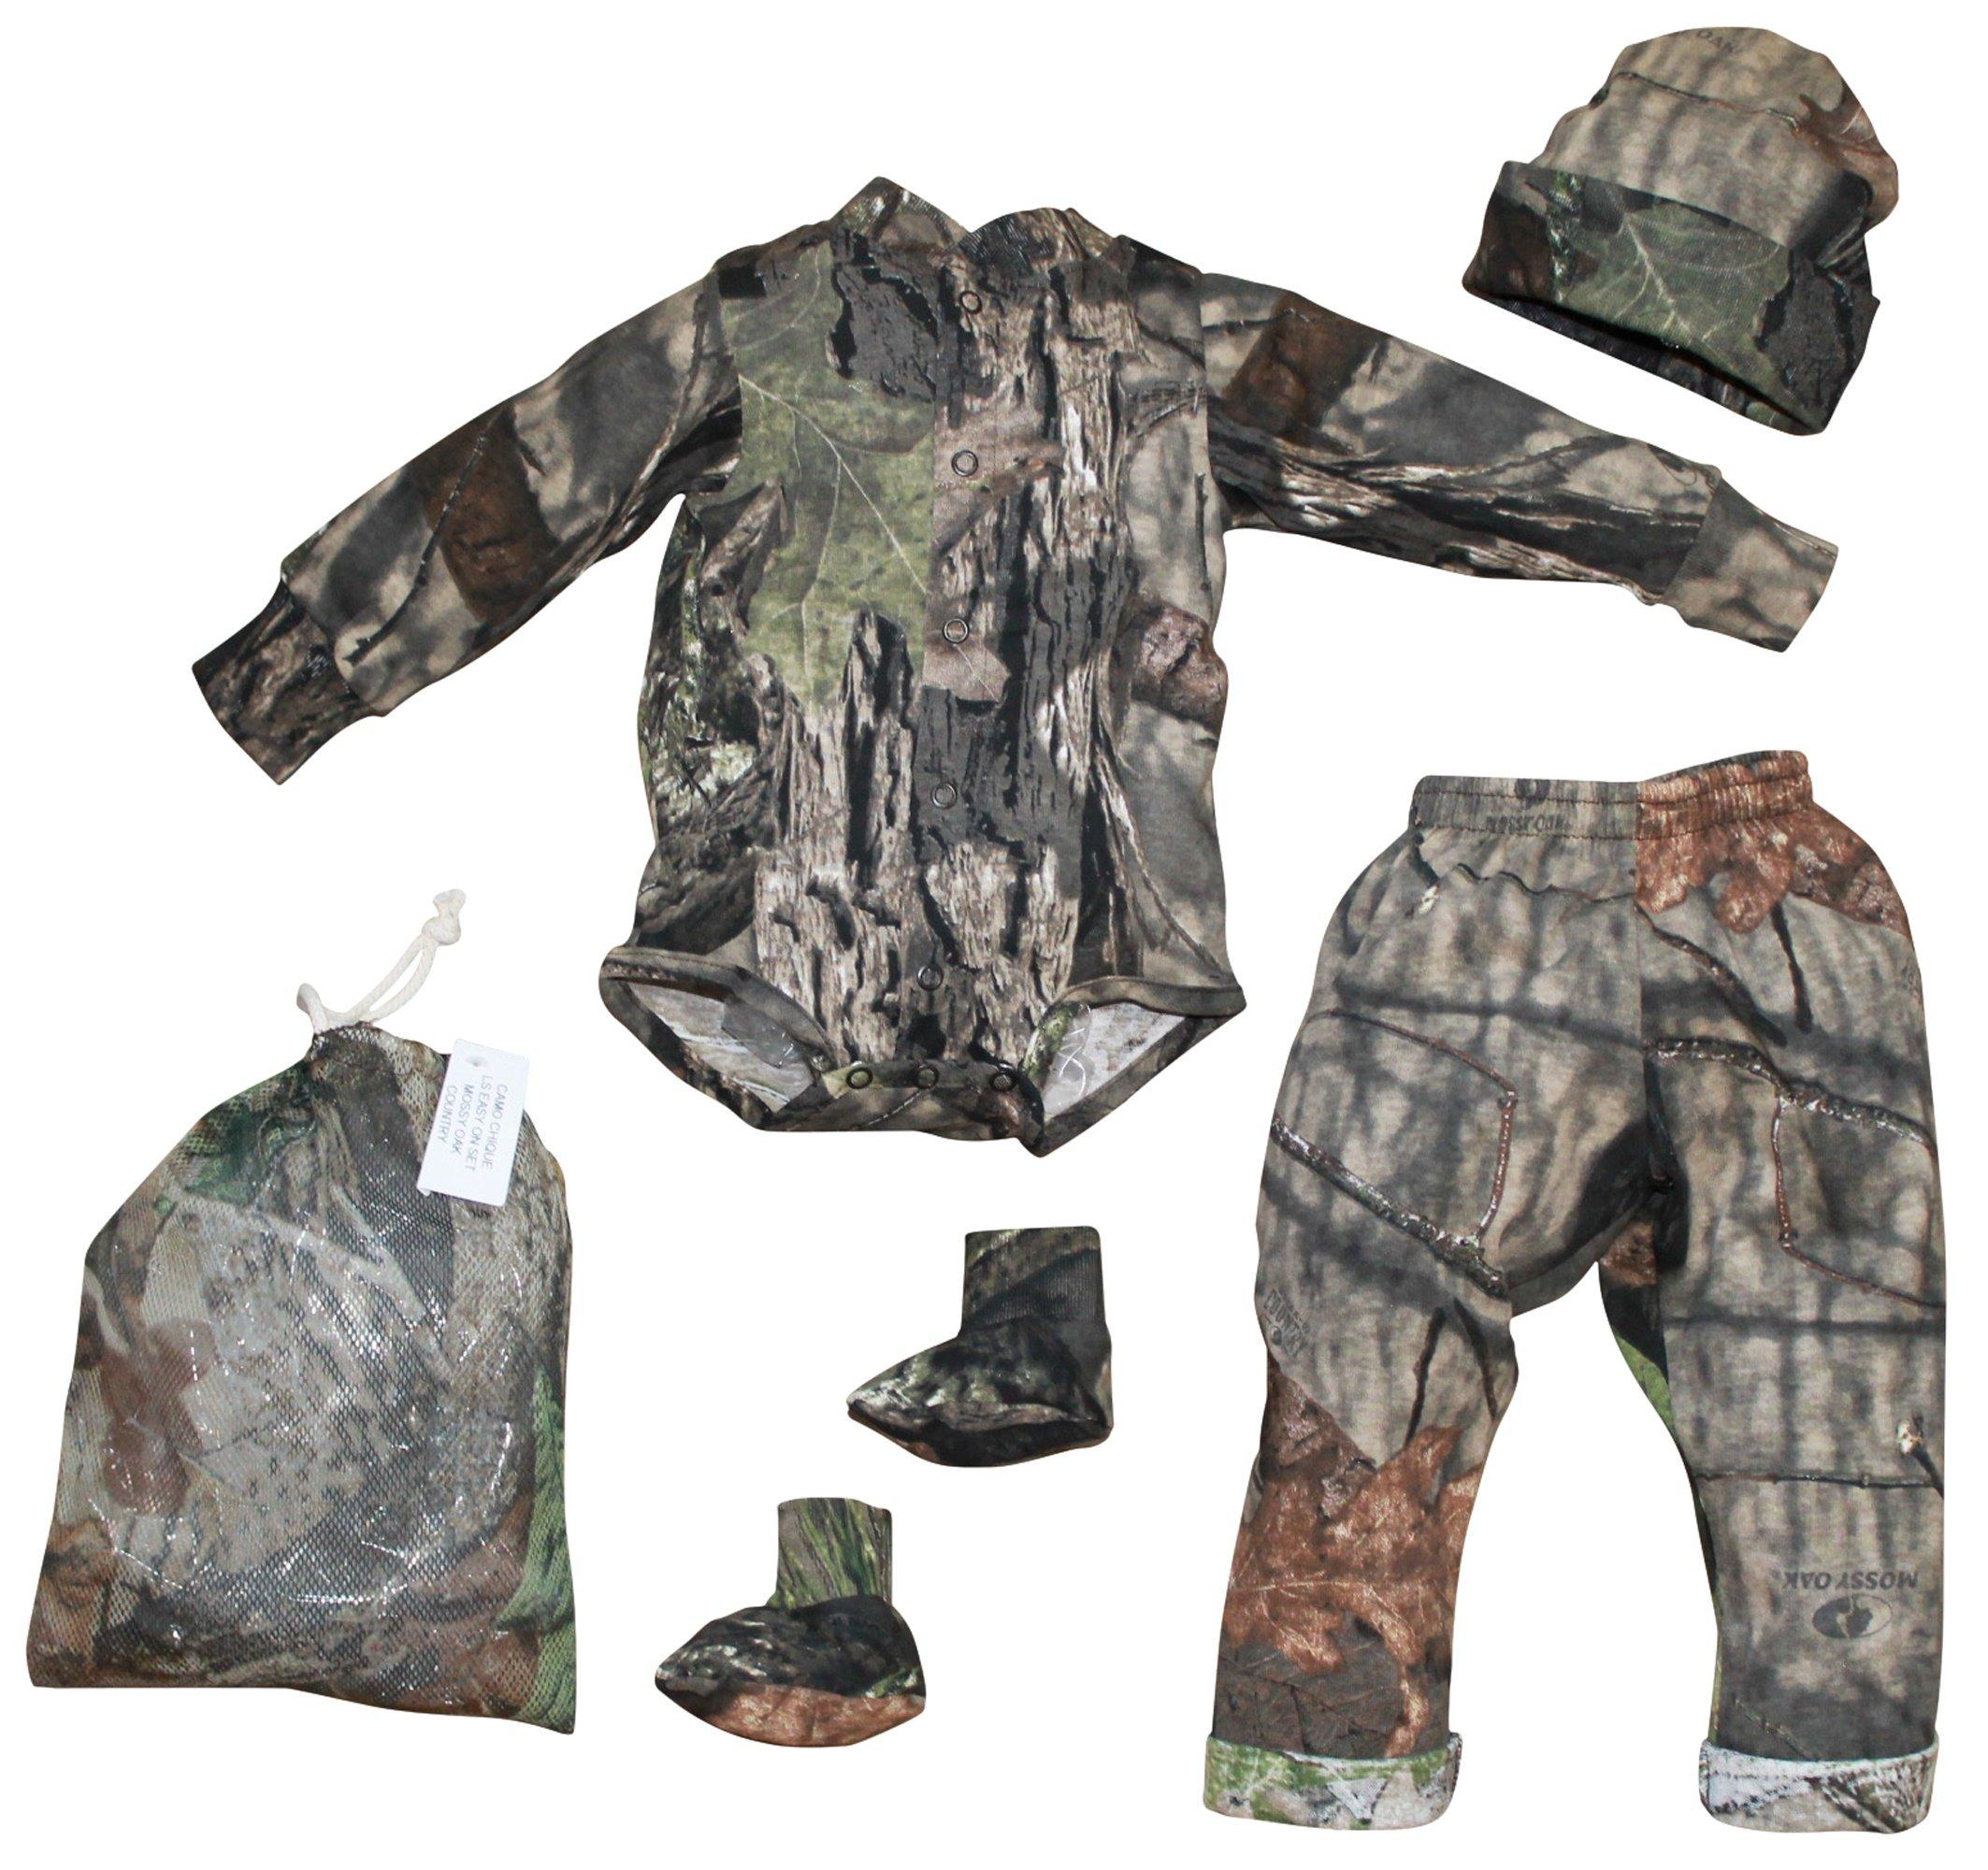 Mossy Oak Baby Boys Camo Outfit 4PC Shirt Pant Cap Booties Set 0 3